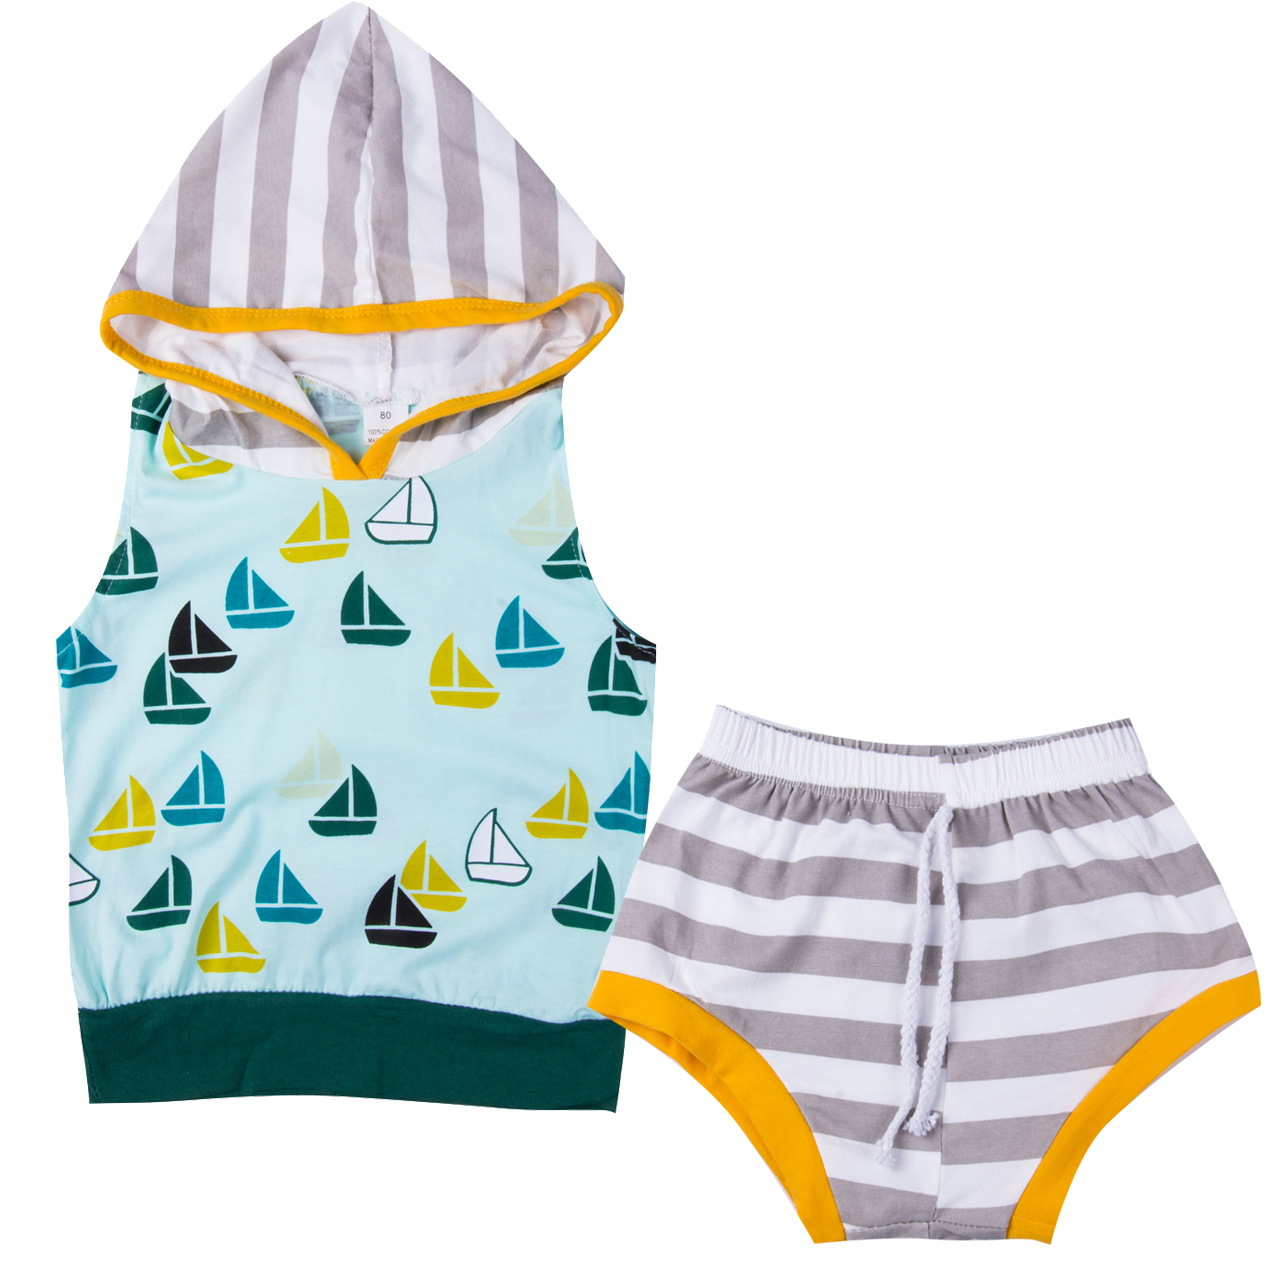 2Pcs Newborn Baby Boy Girl Hooded Sleeveless Sweatshirt Striped Short Pants Outfits Clothes Set